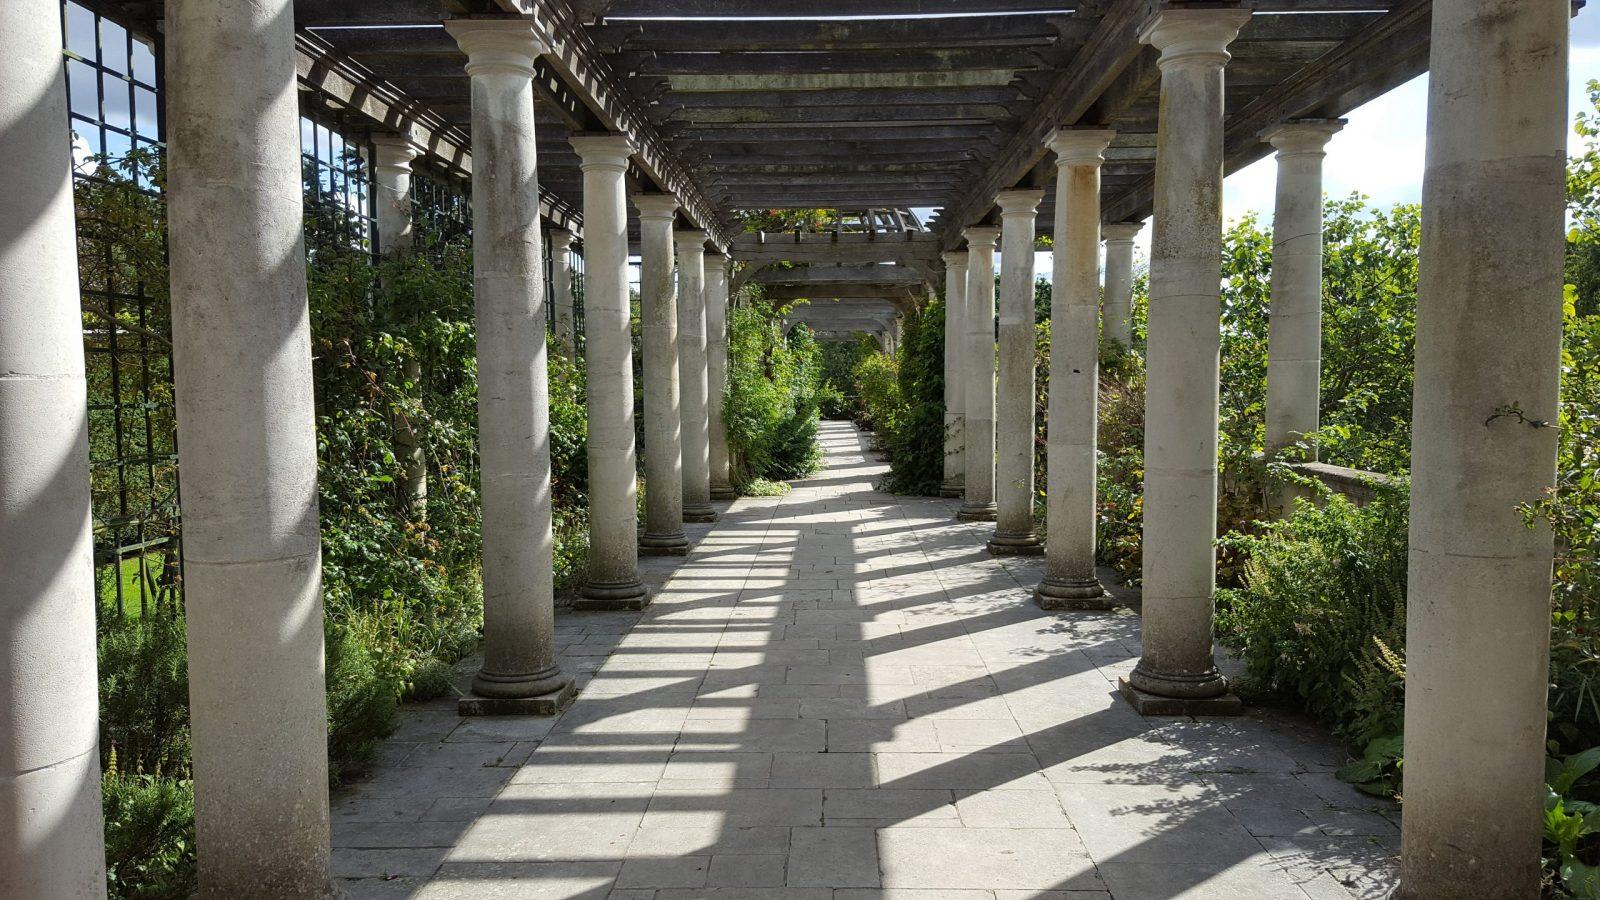 Visiting Hill Garden & Pergola, Hampstead Heath: Photo Gallery 20